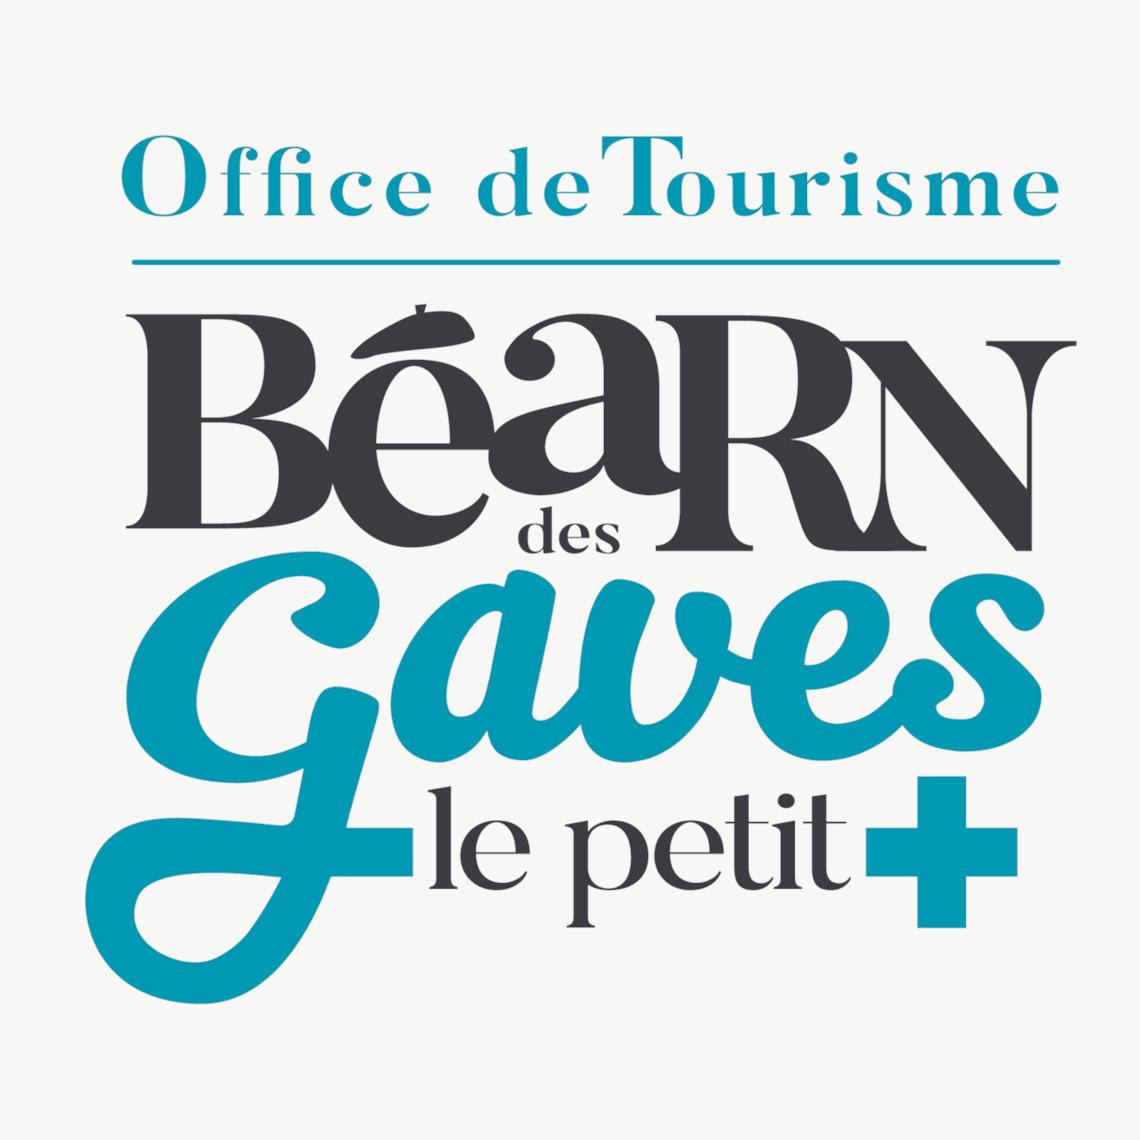 Office de tourisme du Béarn des gaves